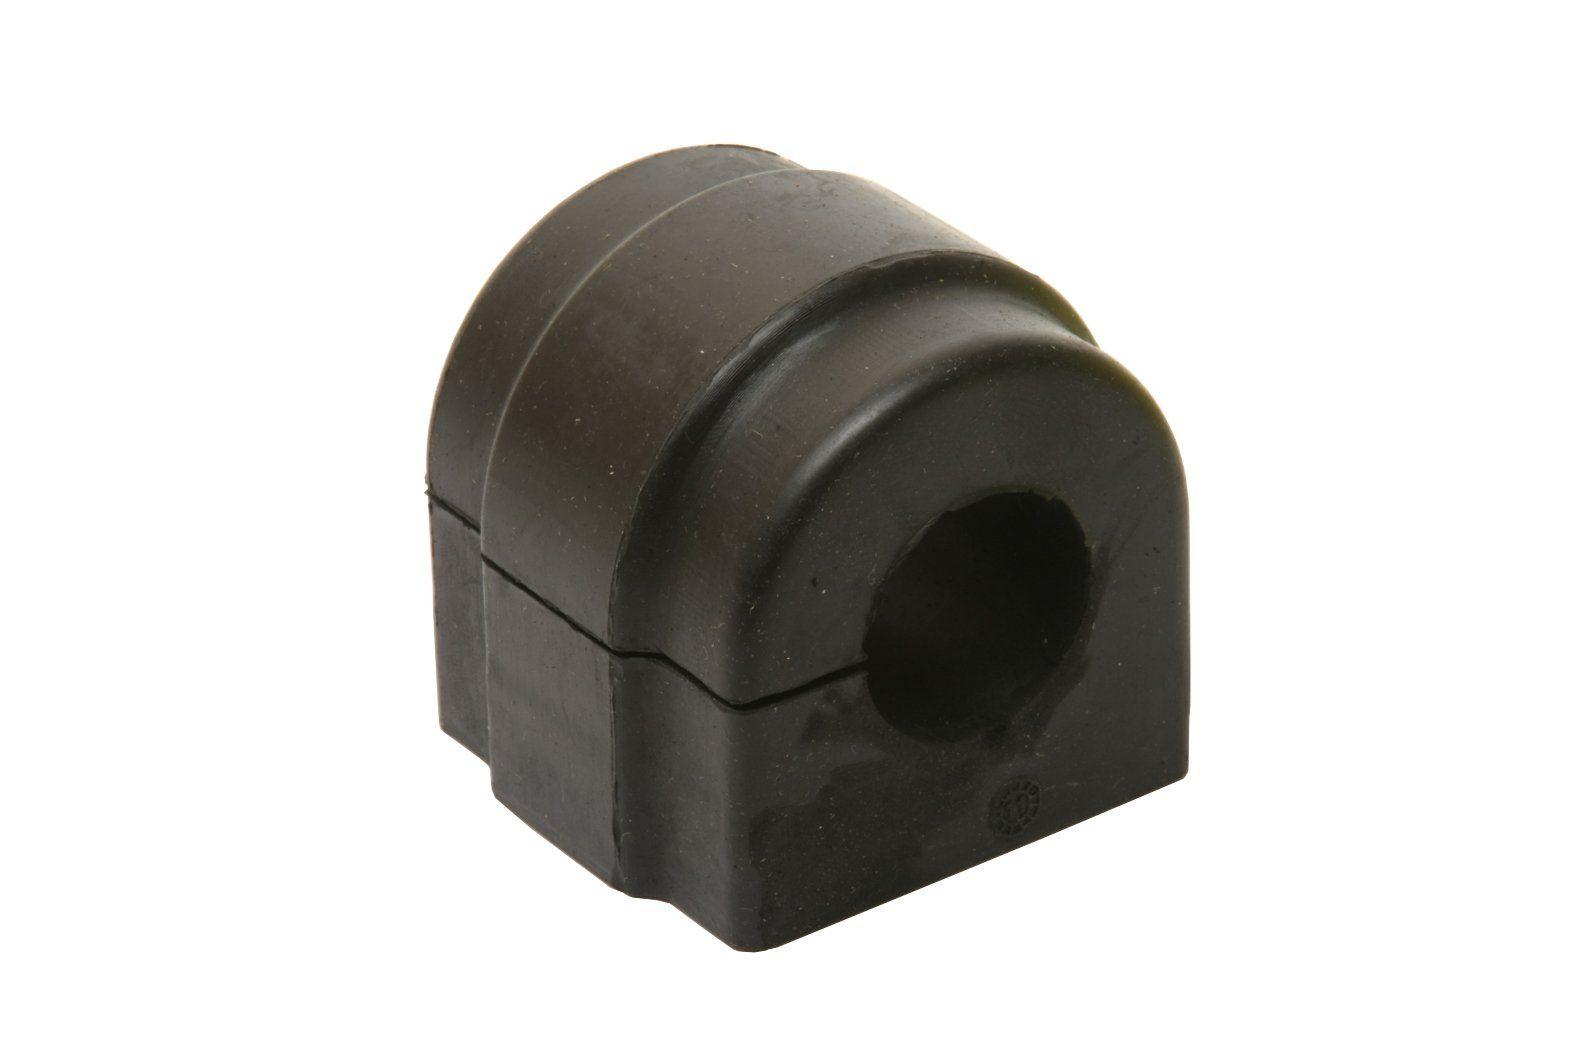 втулка стабилизатора Точка опоры 18011603